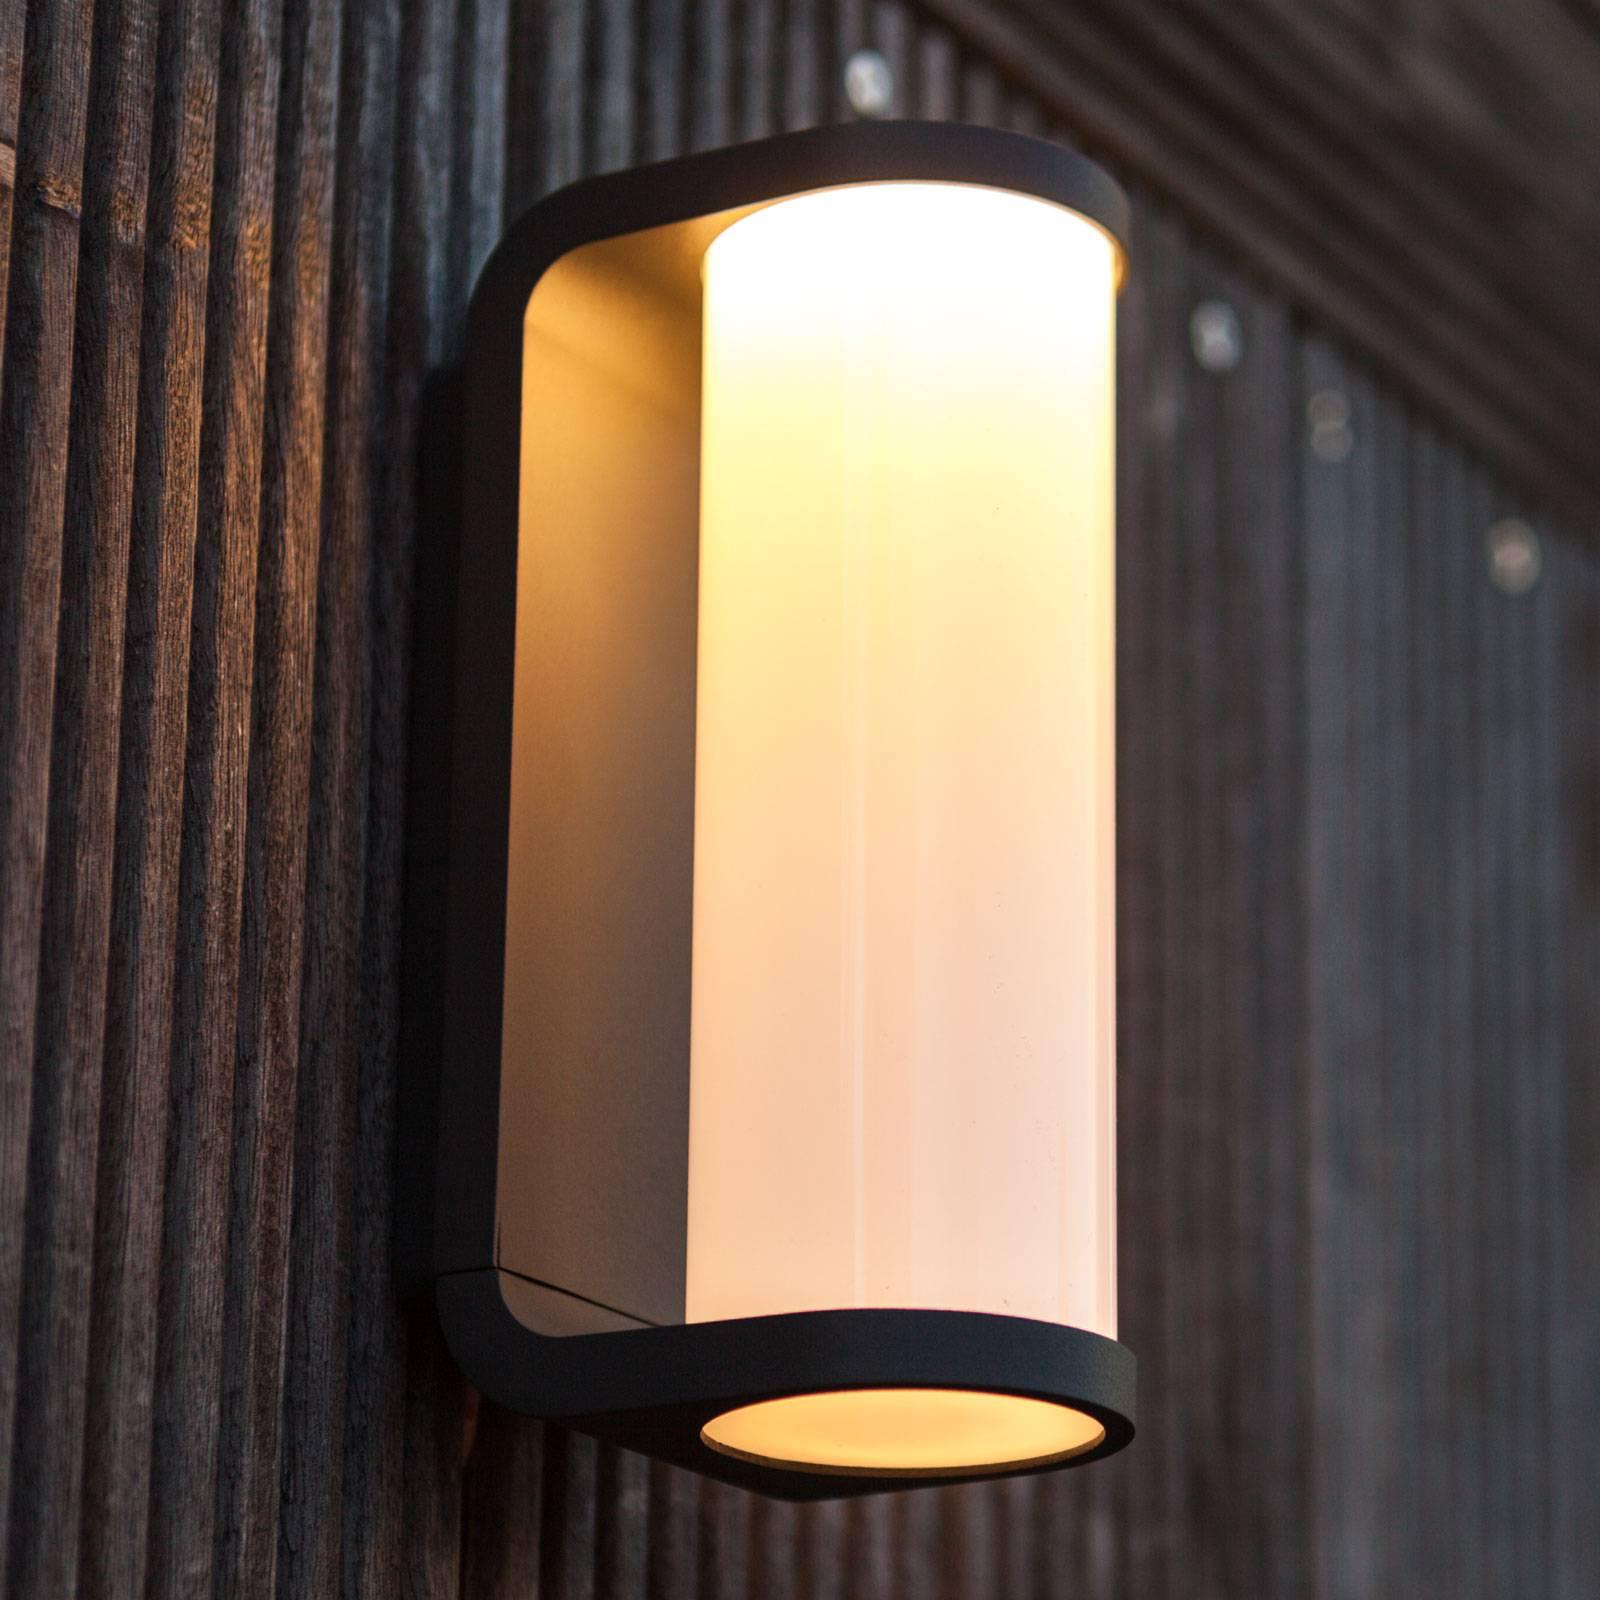 LED-ulkoseinälamppu Adalyn